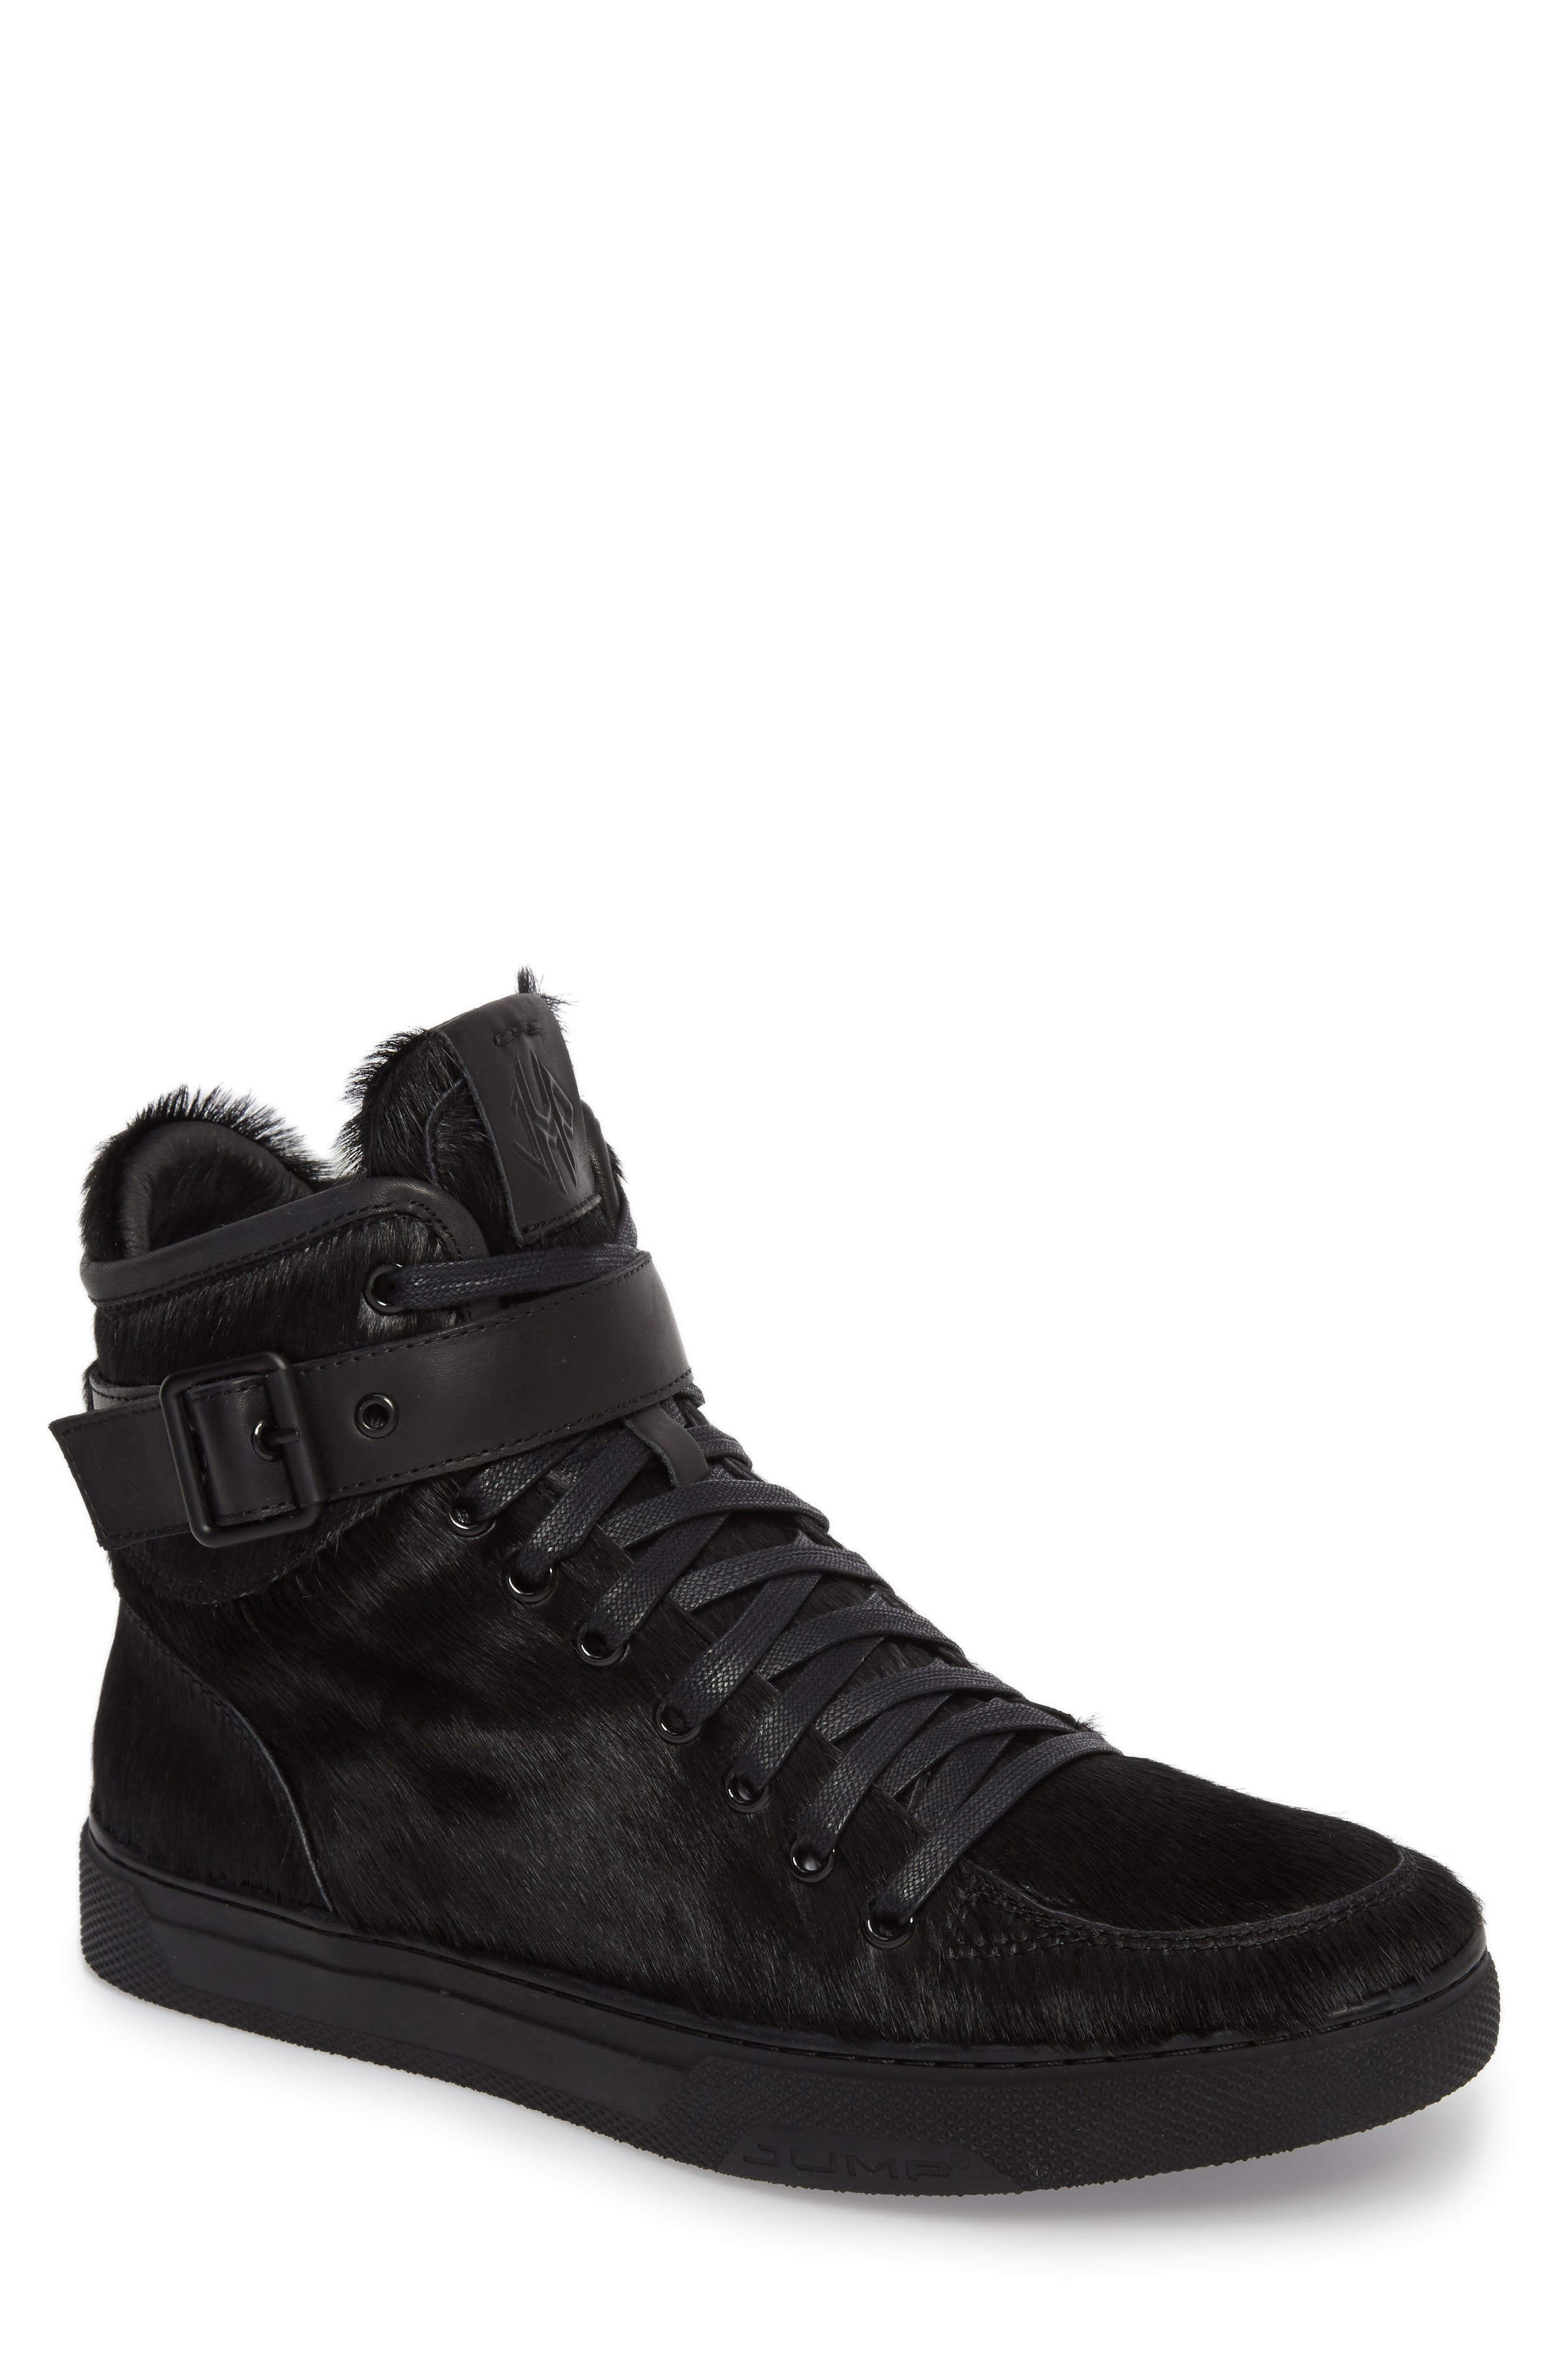 Sullivan Genuine Calf Hair High Top Sneaker,                             Main thumbnail 1, color,                             002